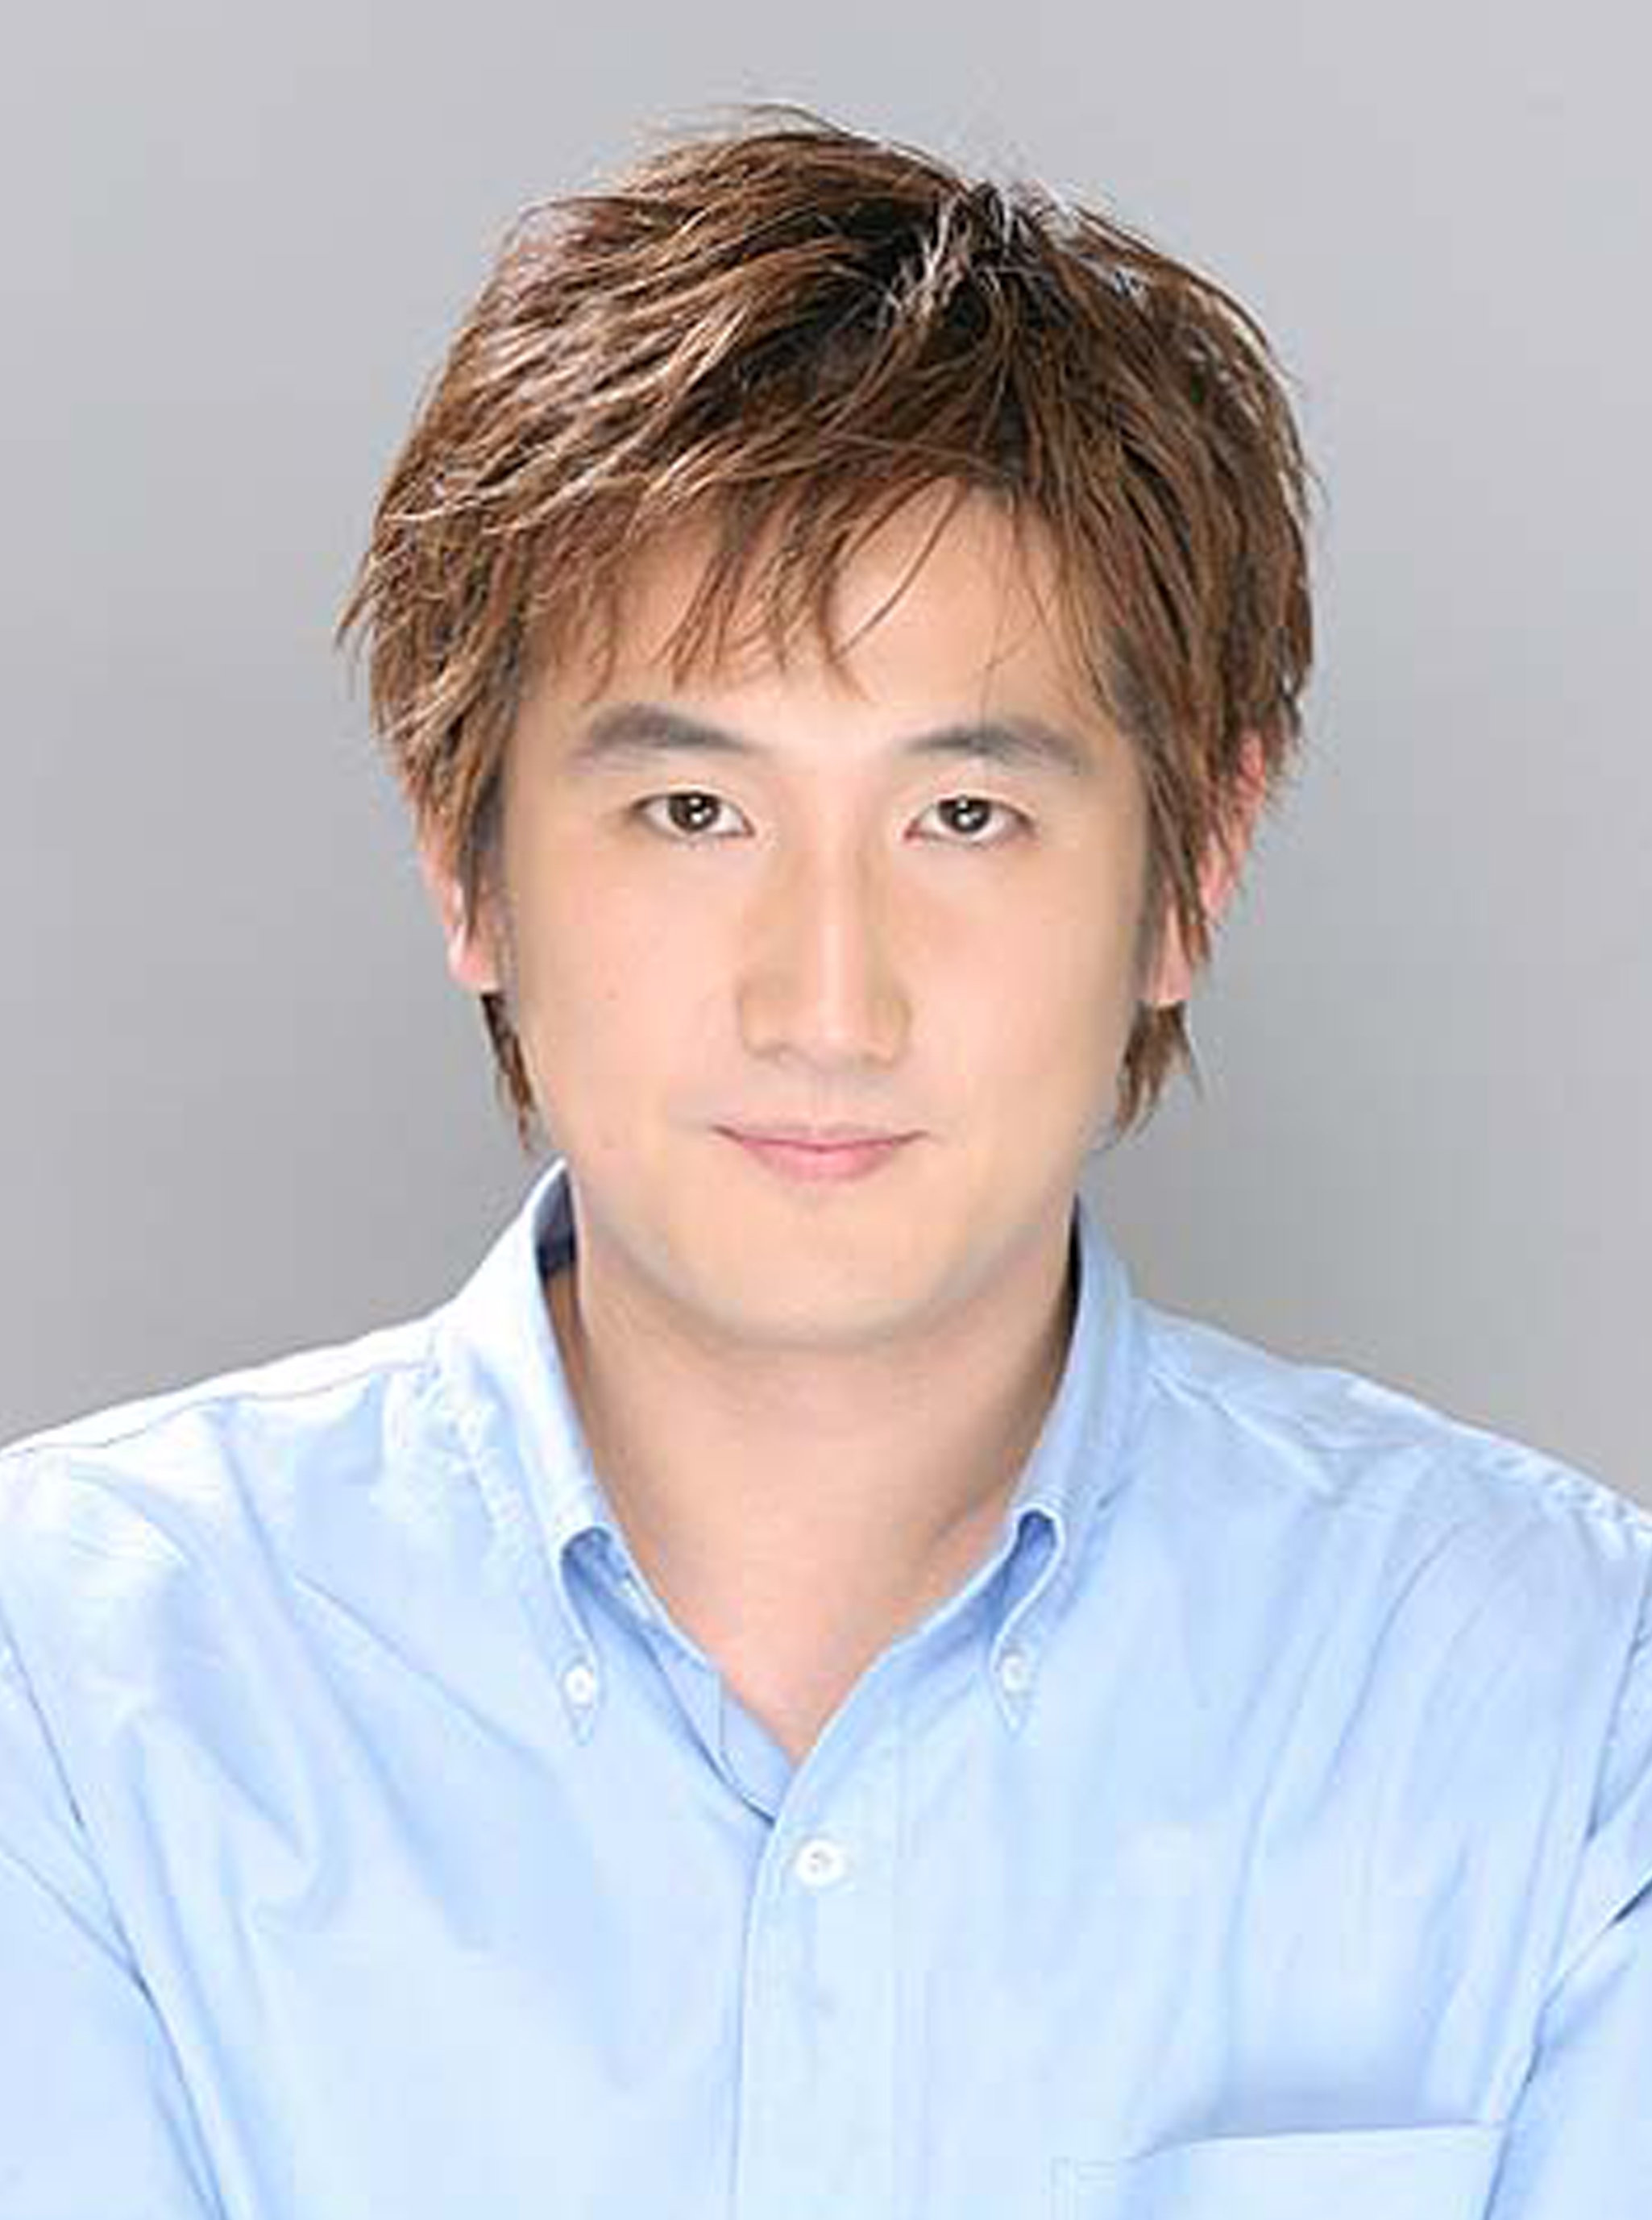 File:HiroshiTsuchida.png